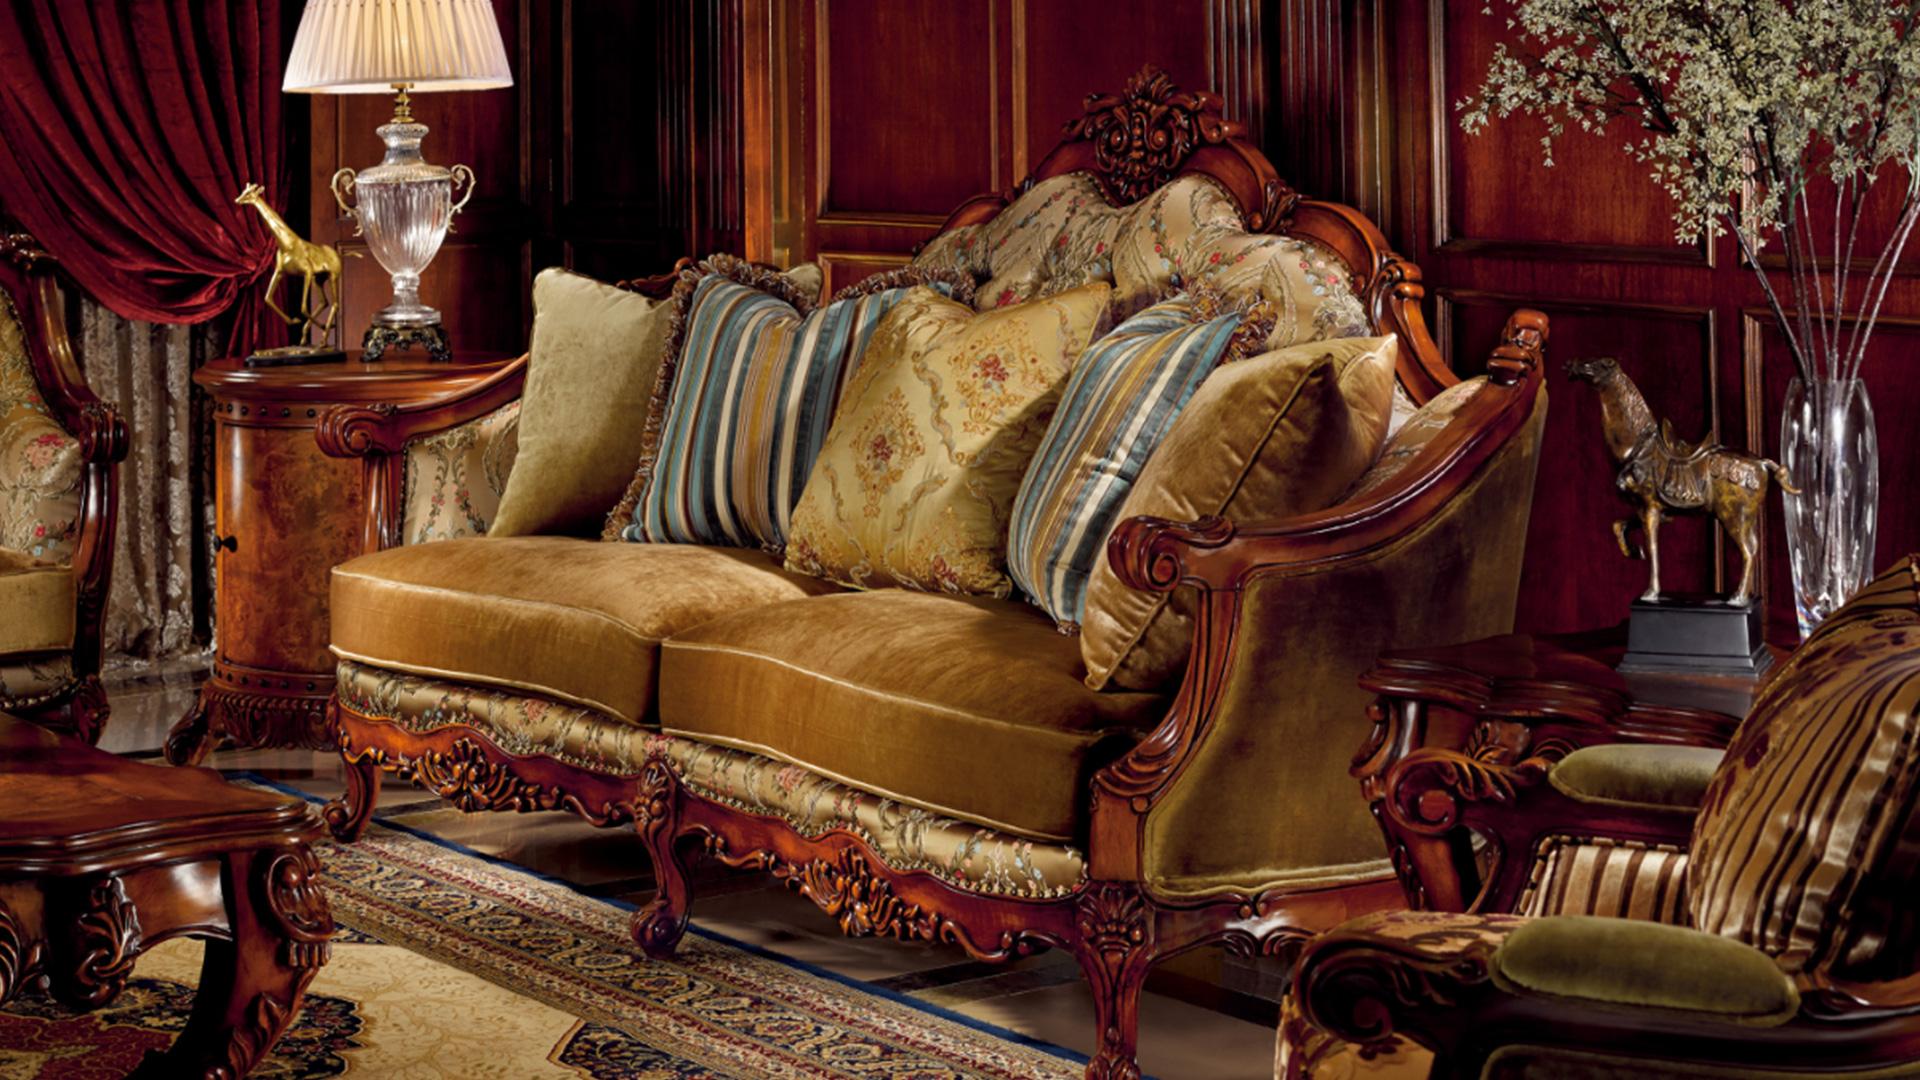 Qonaq Otagi Goodwin Gf61 Ucun Son Taxta Divan Dizaynlari 2021 Goodwin Furniture